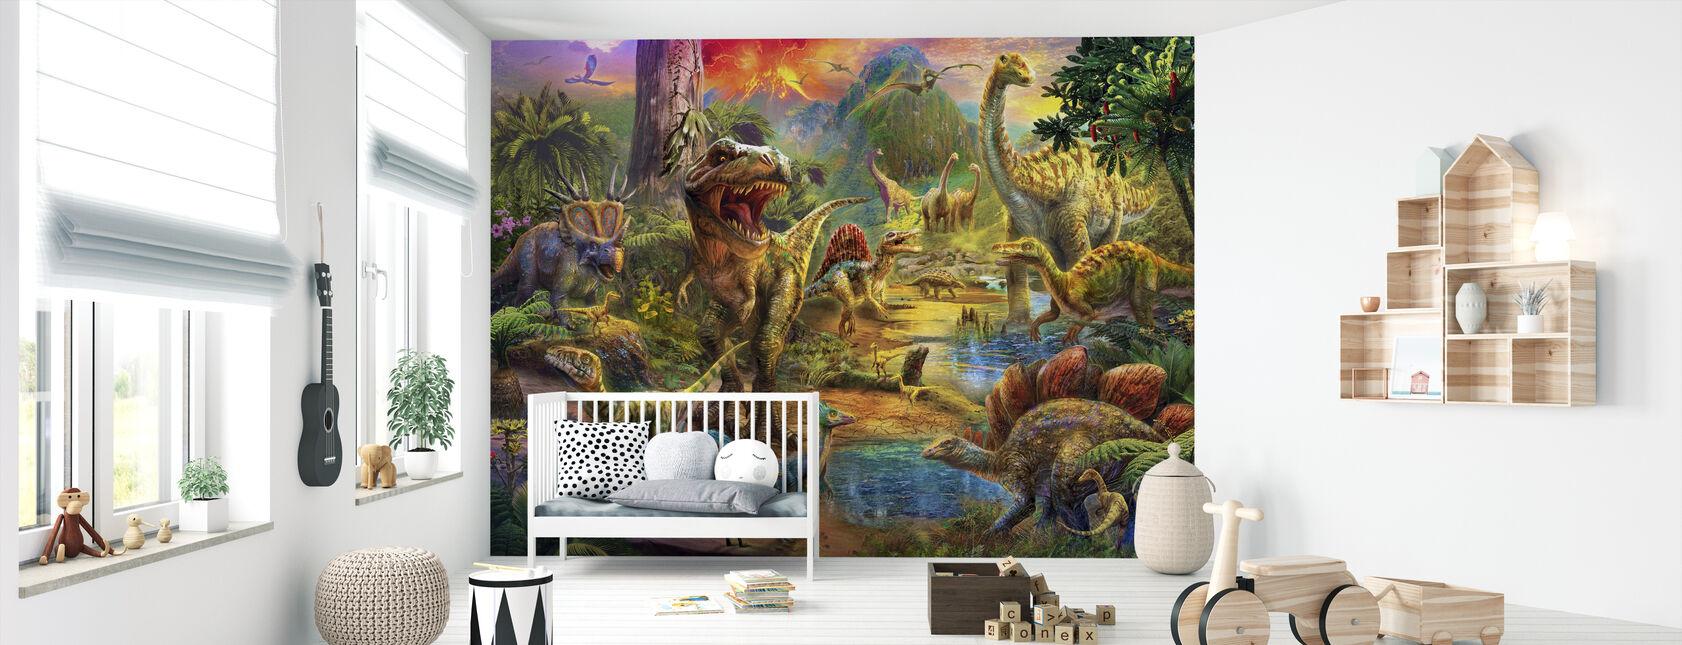 Landscape of Dinosaurs - Wallpaper - Nursery